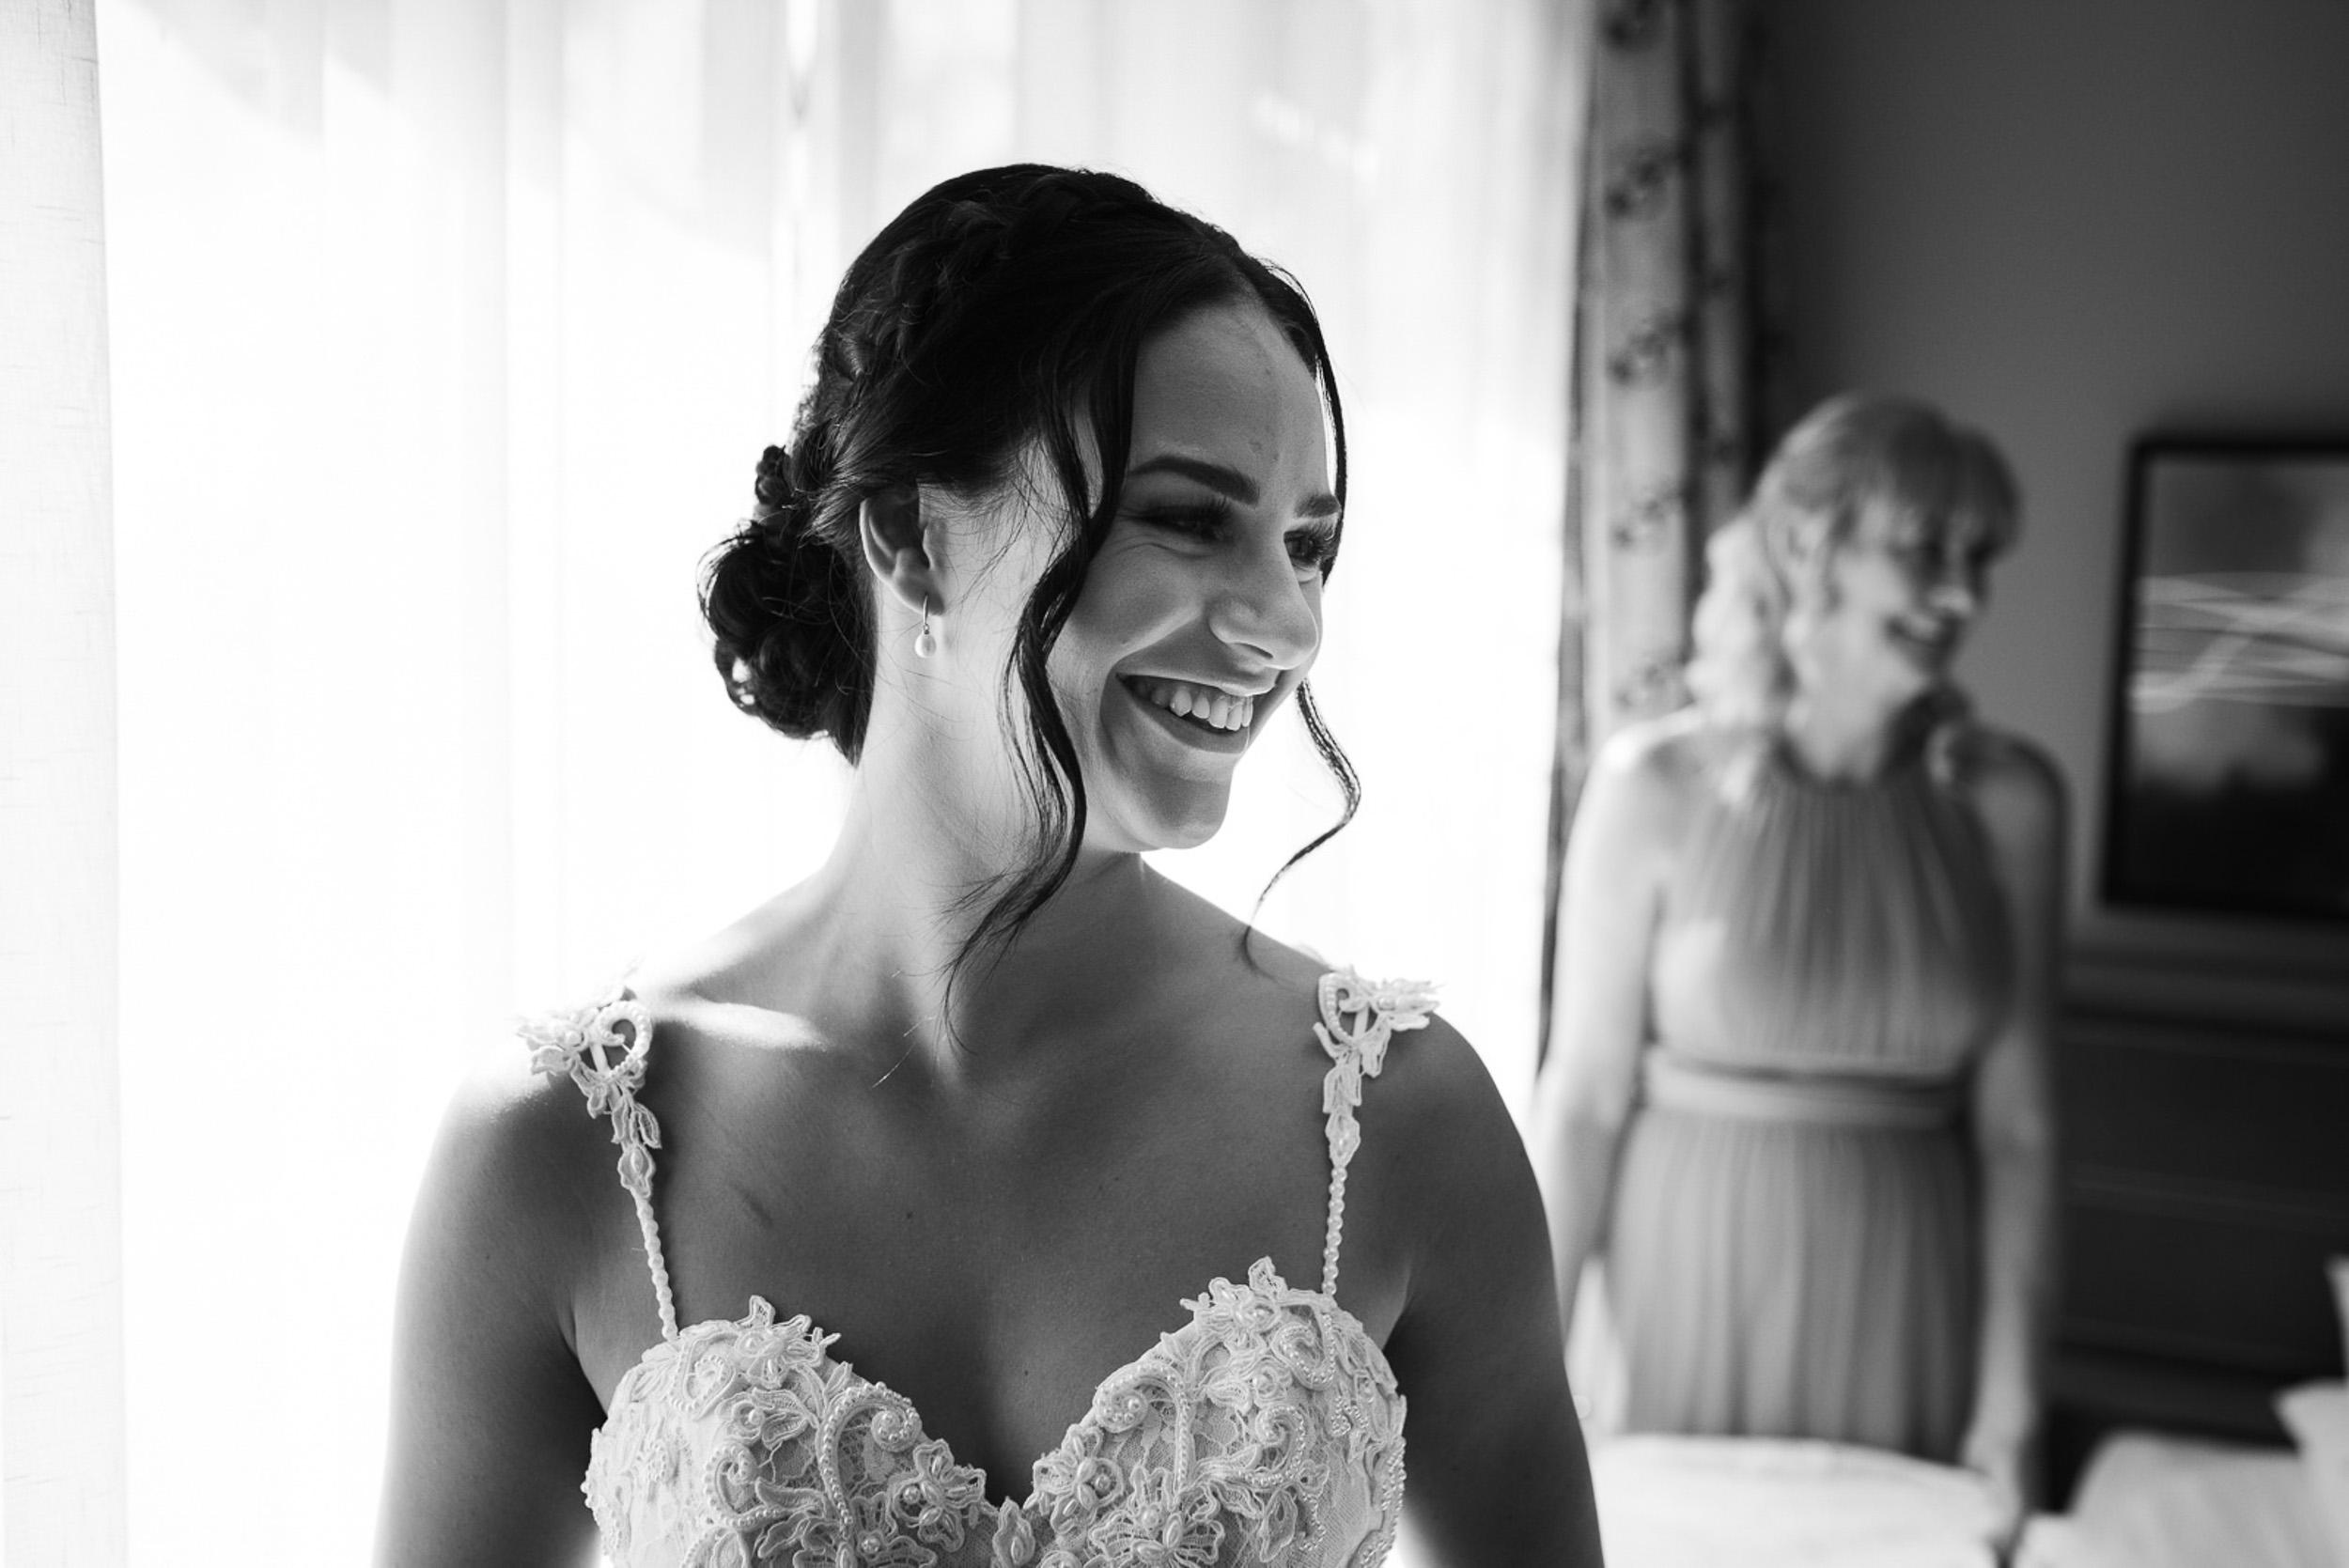 The Raw Photographer - Cairns Wedding Photographer - Fitzroy Island - Destination Wedding - Bride Dress - Groom Portrait - Queensland-12.jpg